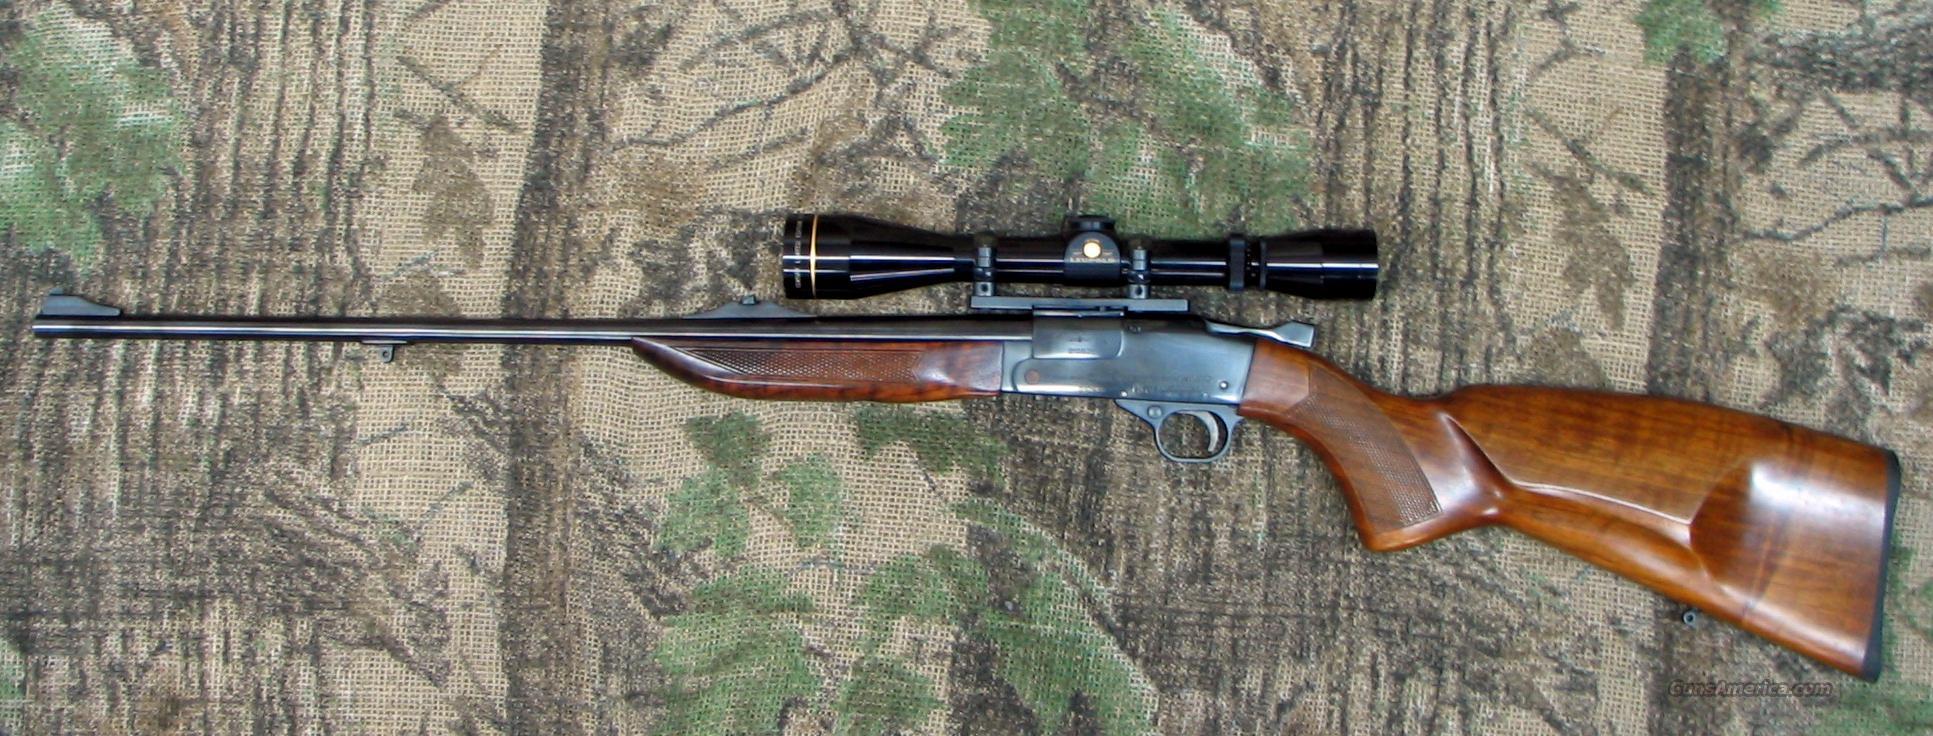 BRNO ARMS Mod  ZBK110 Single Shot Rifle, 223 Cal